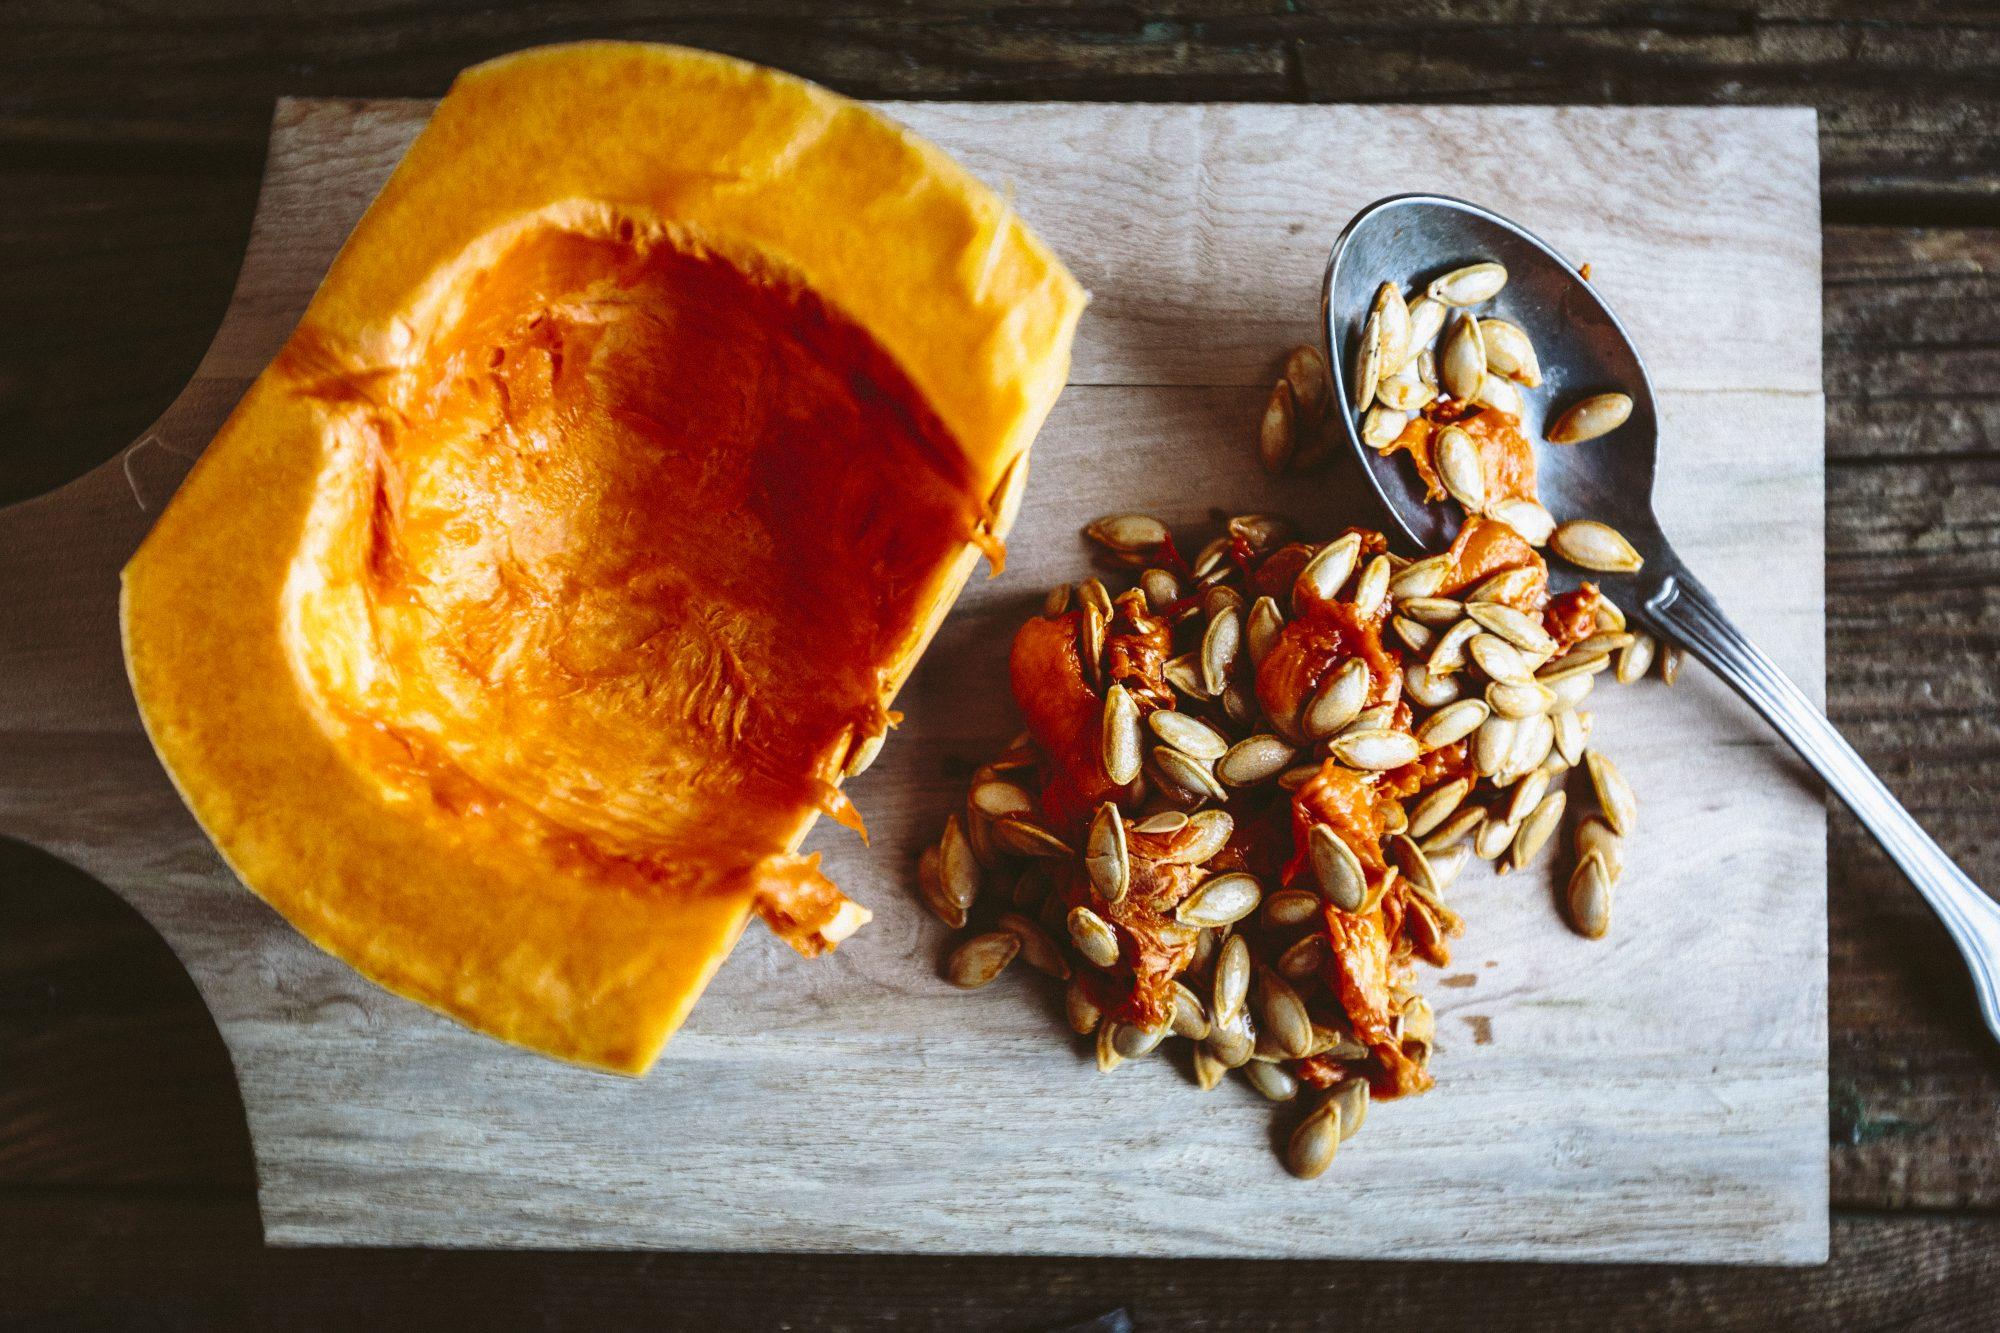 Cut pumpkin with pumpkin seeds and spoon.